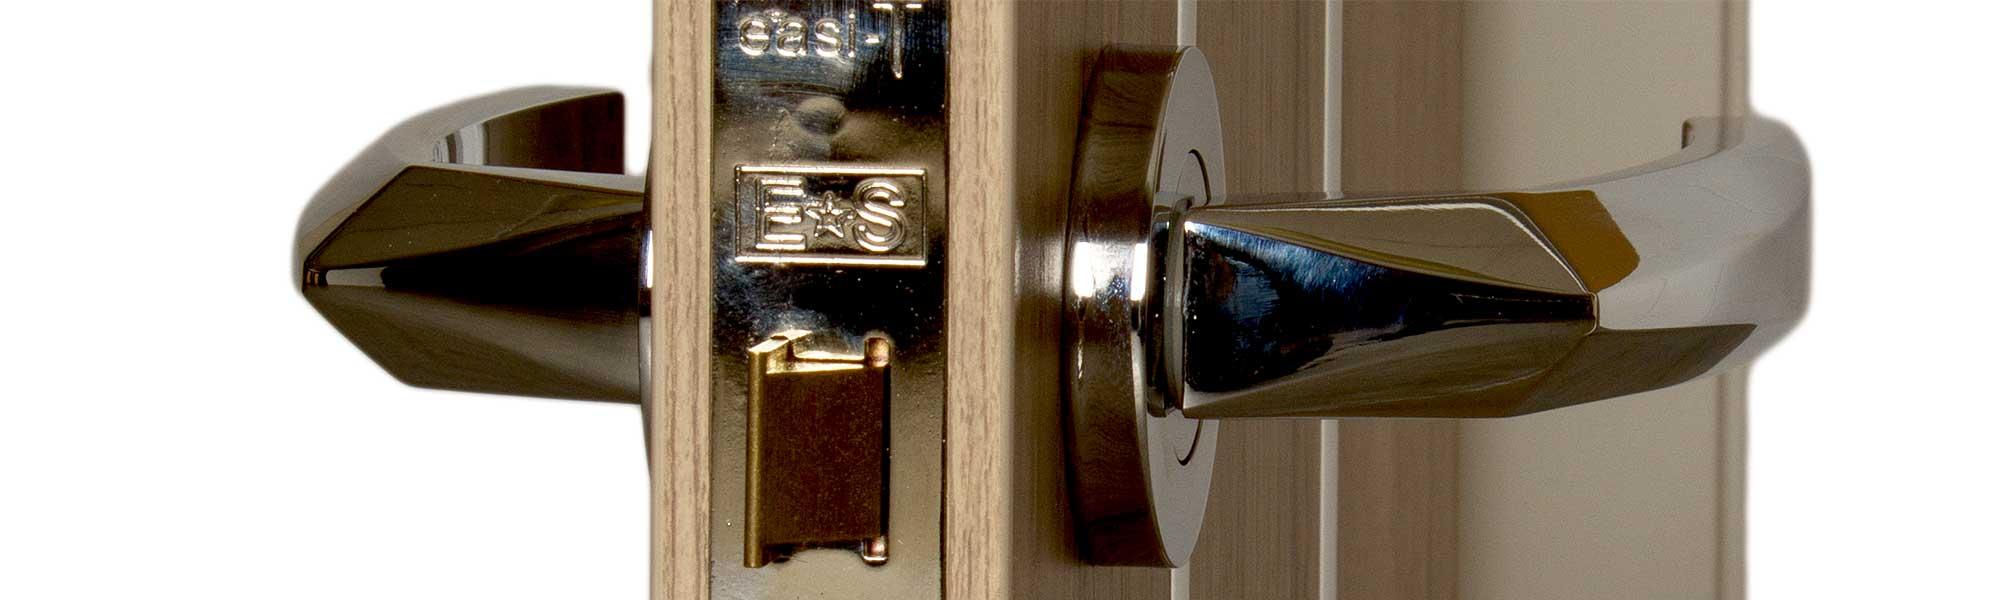 Morland Door Sets, Frames & Architraves